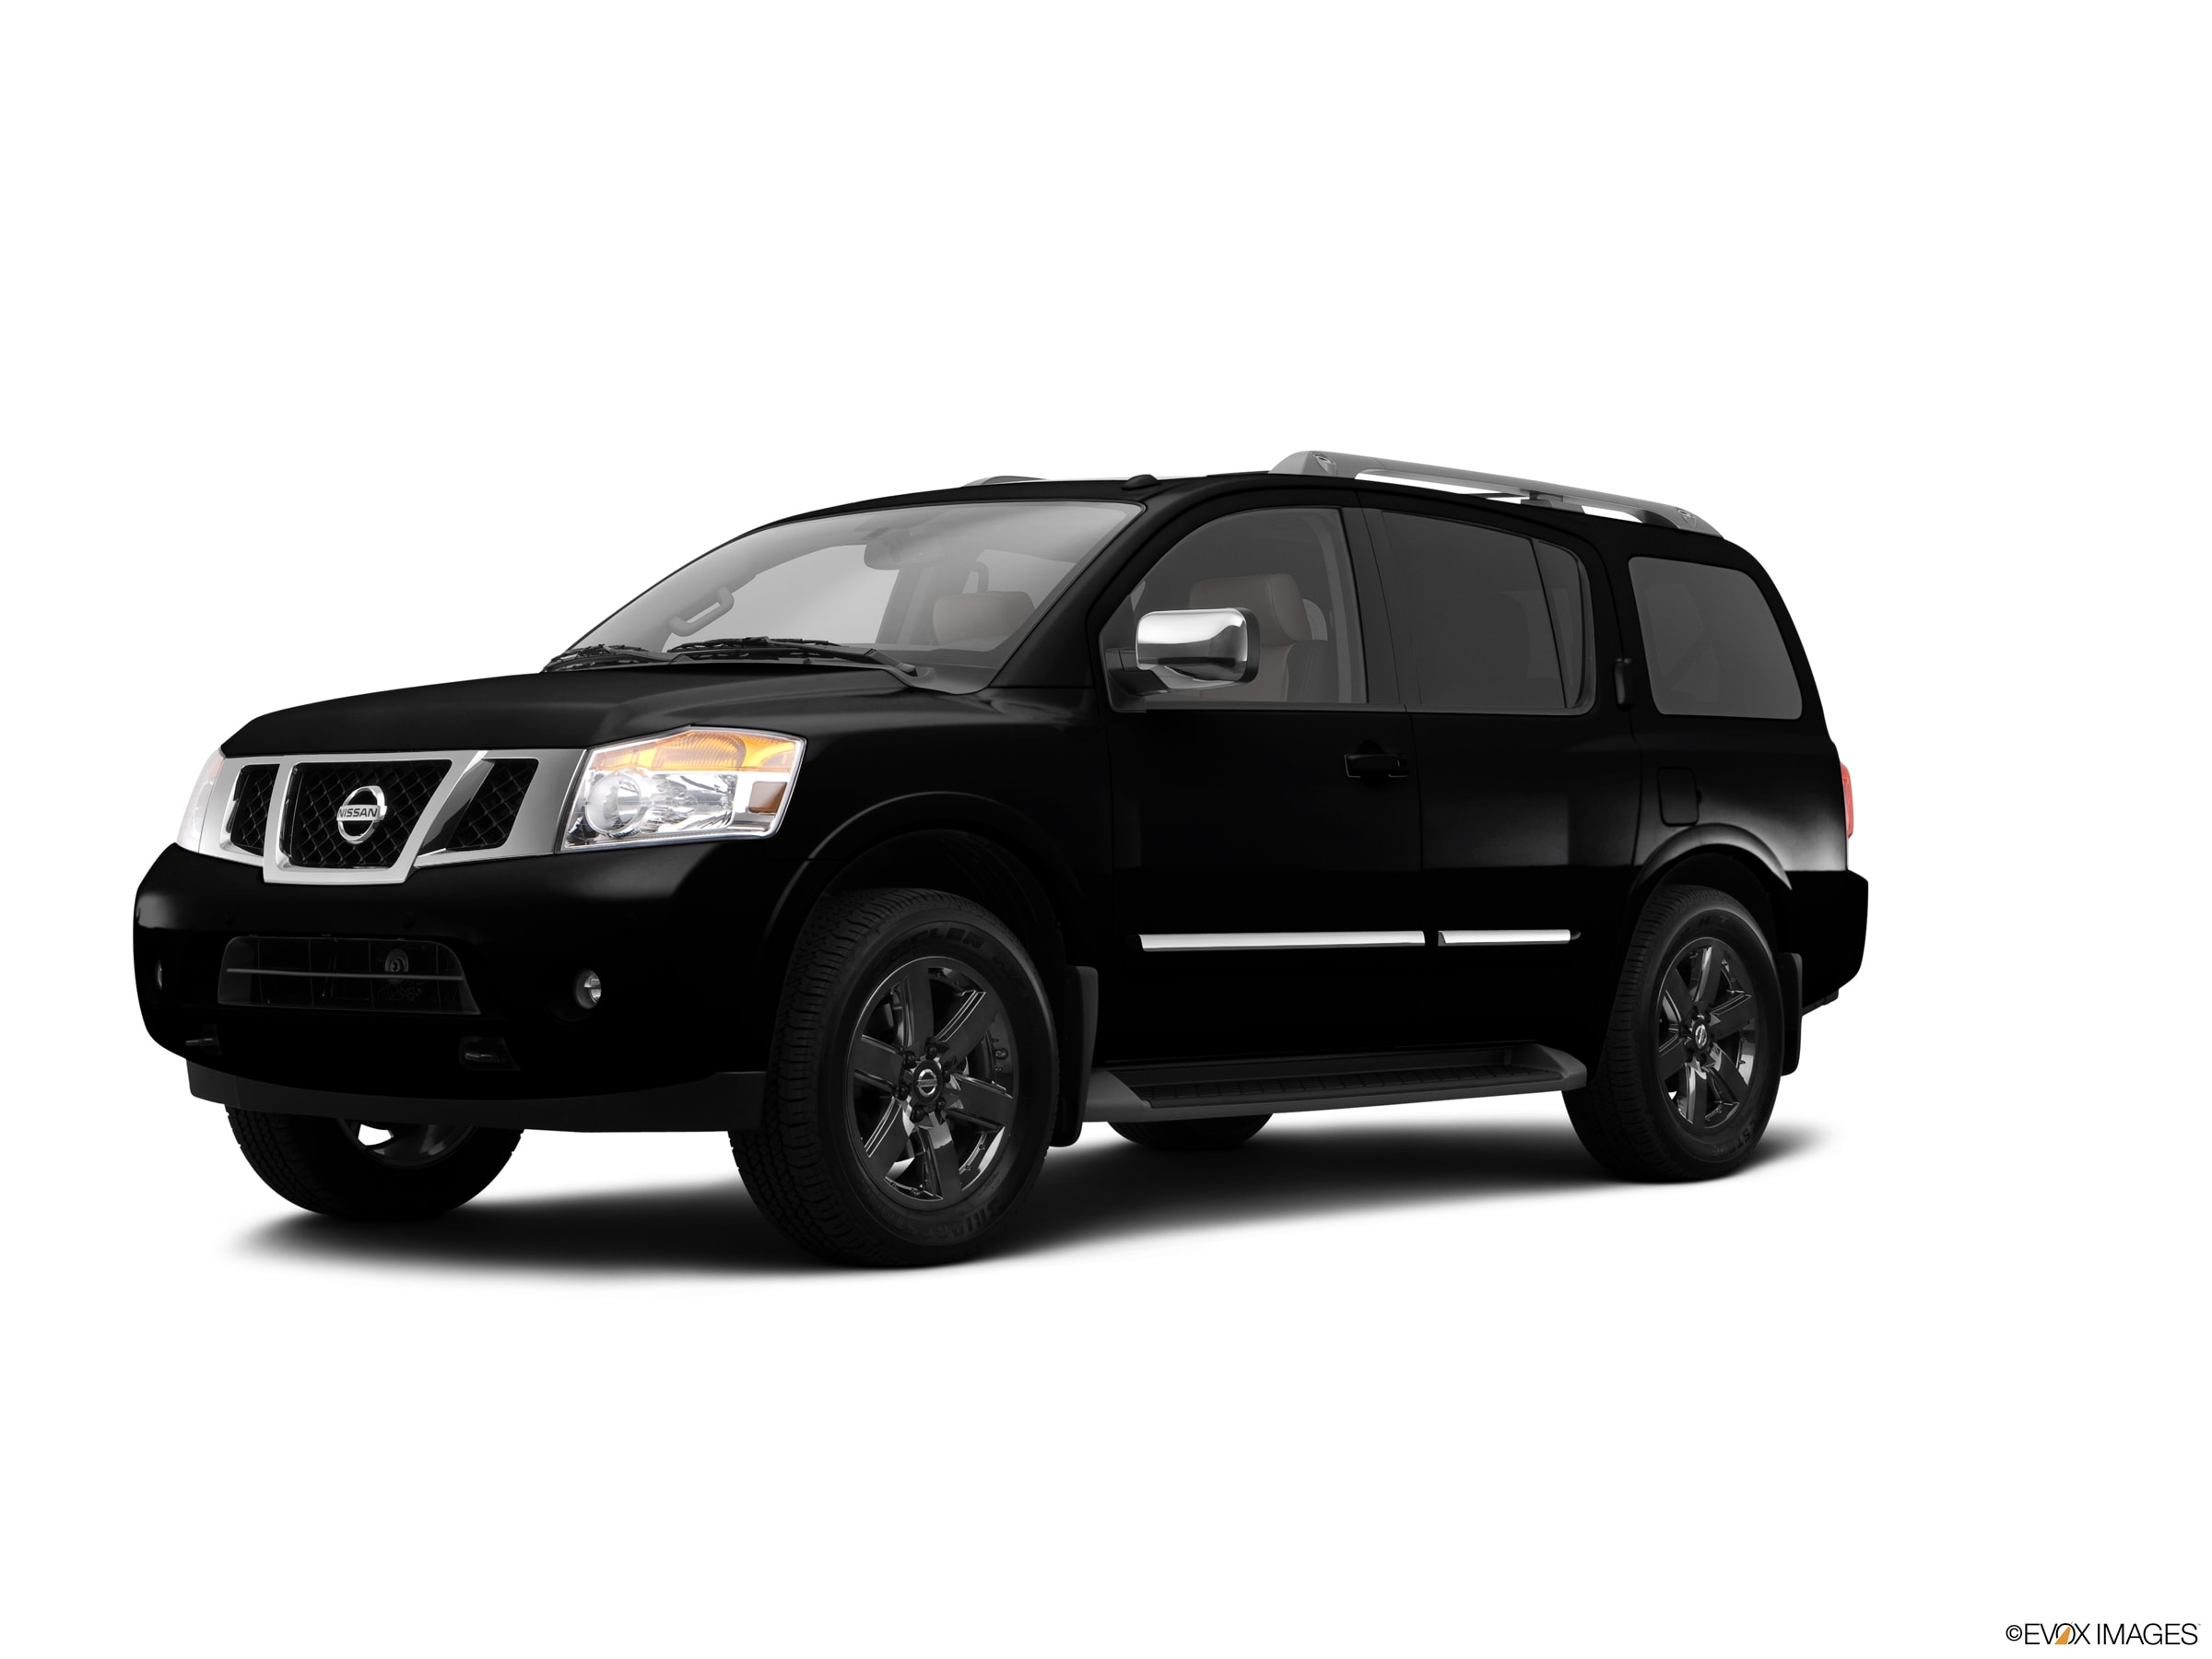 2015 Nissan Armada SUV